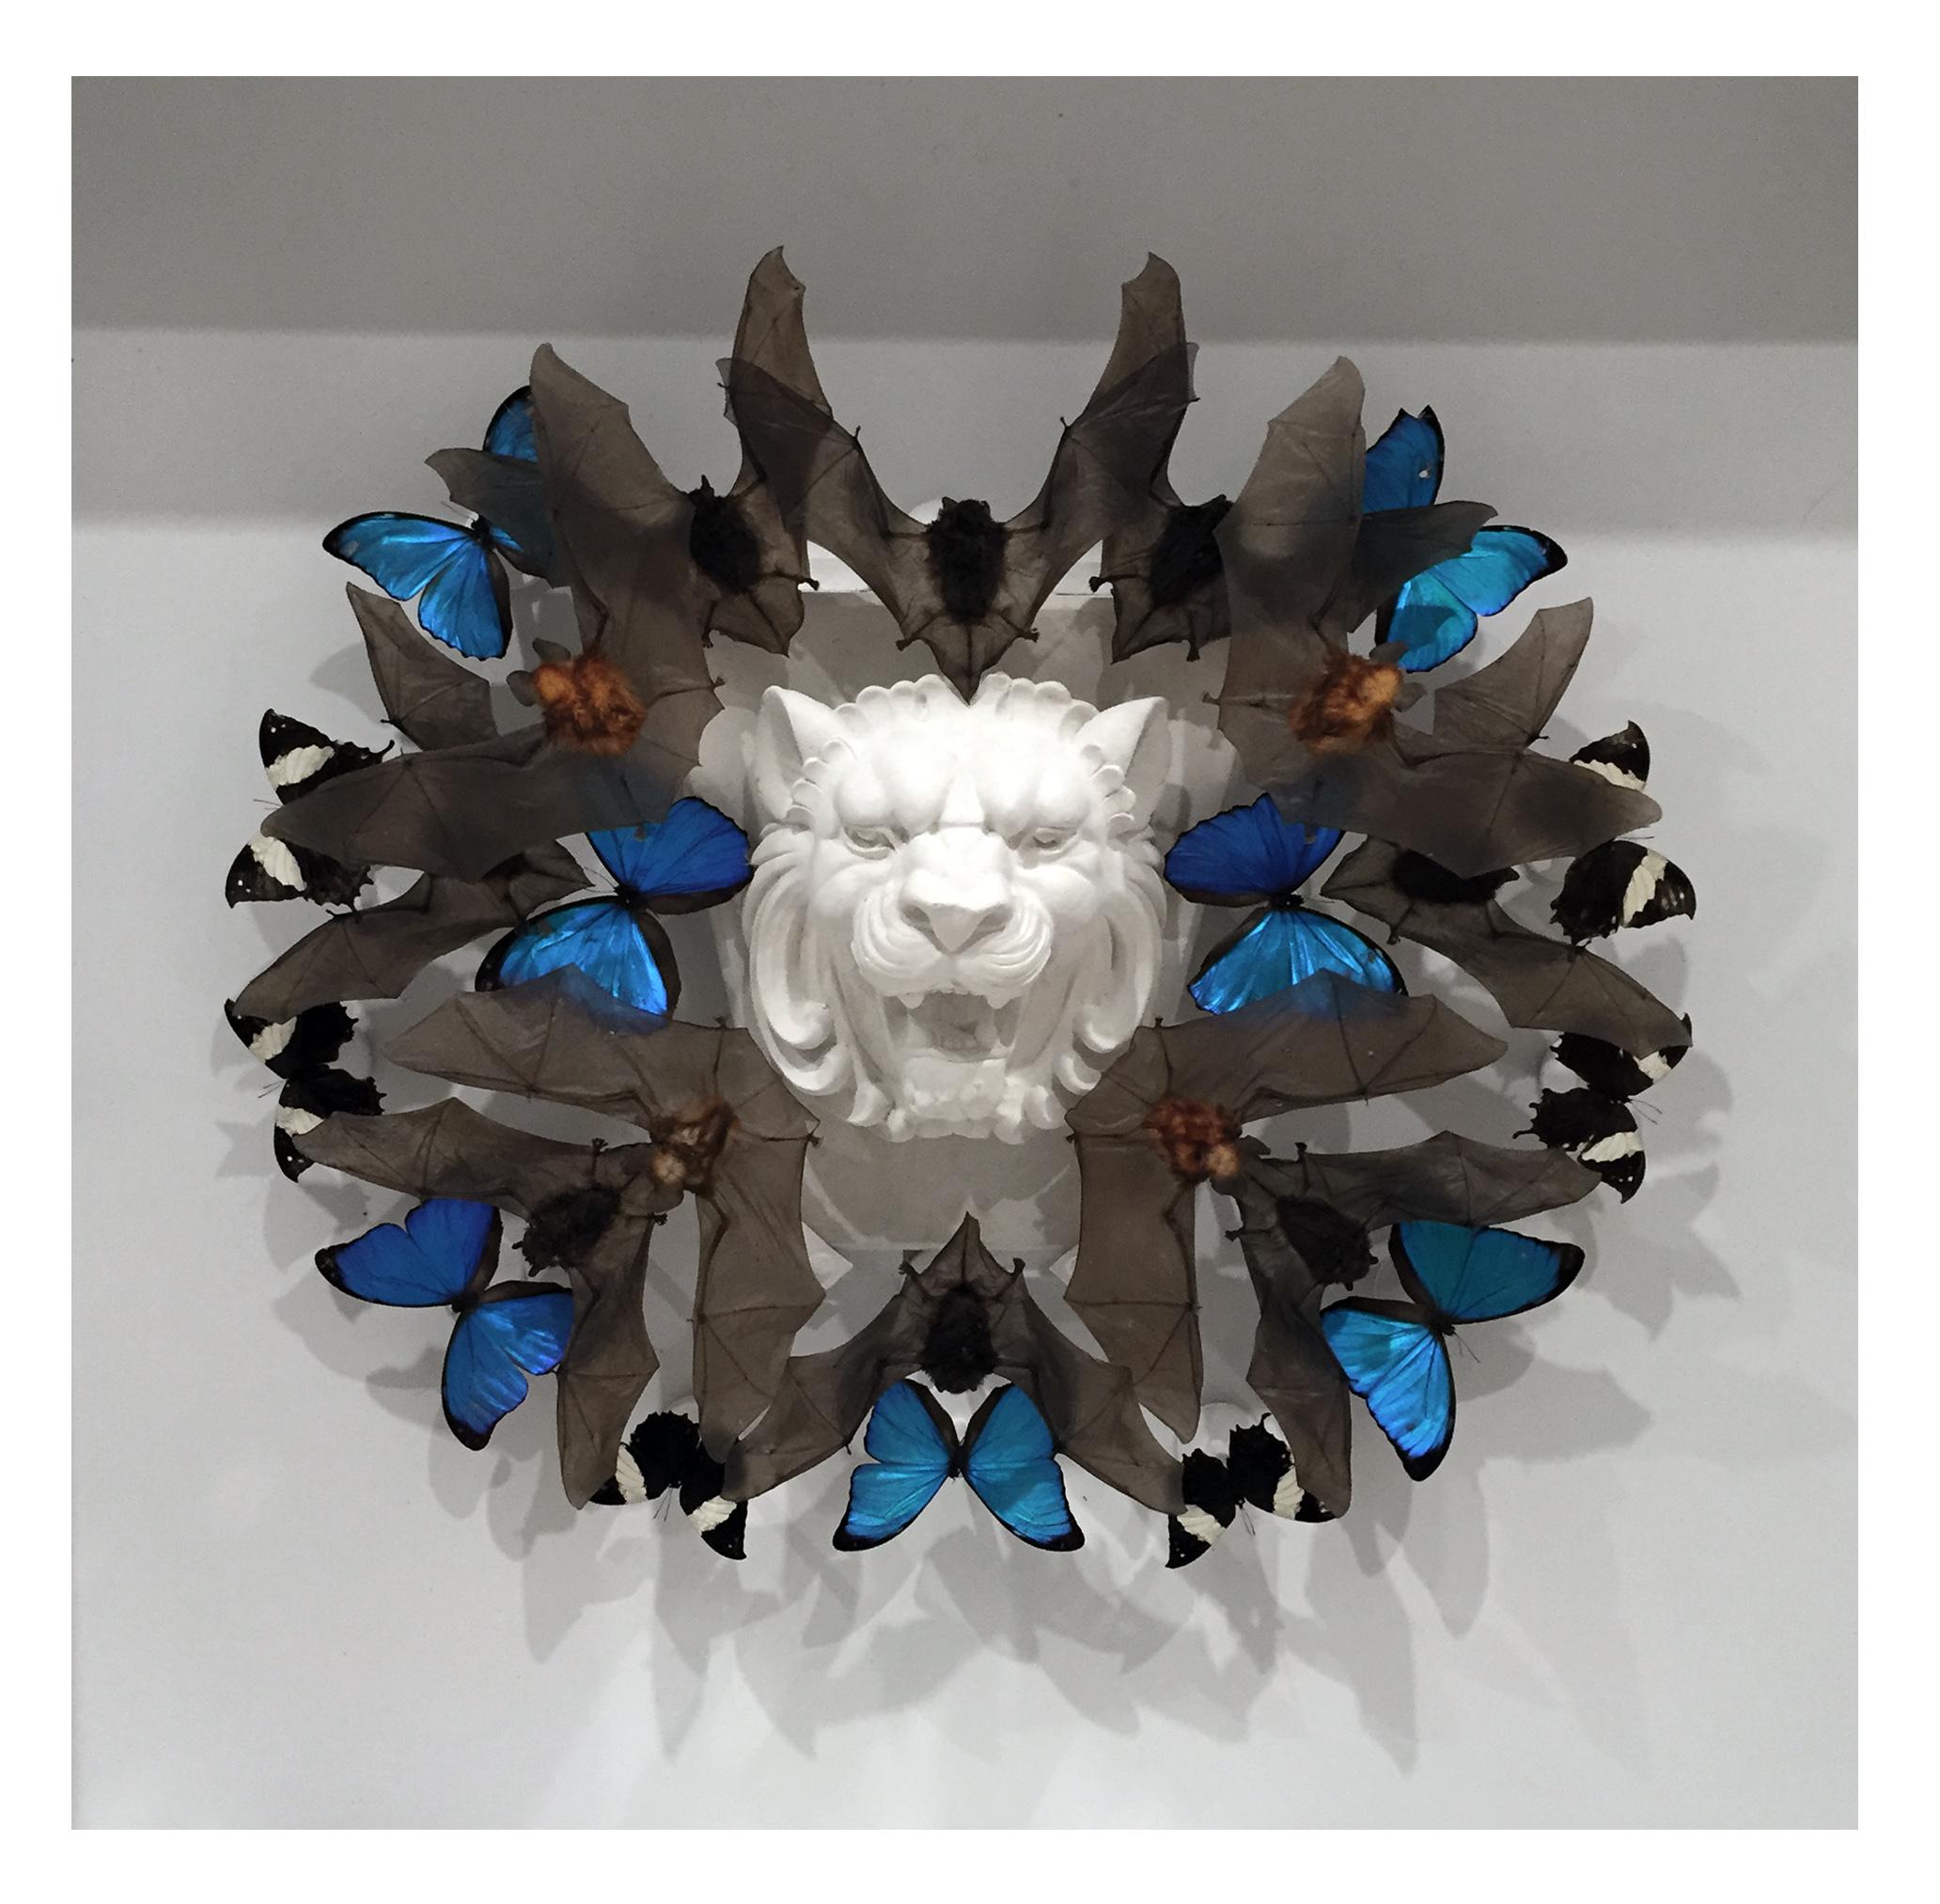 "Joseph Grazi, ""Mufasa"" 2016.Taxidermy bats, dried butterflies, and stone sculpture on wood mounted in plexiglass. 34"" x 34"" x 8""."